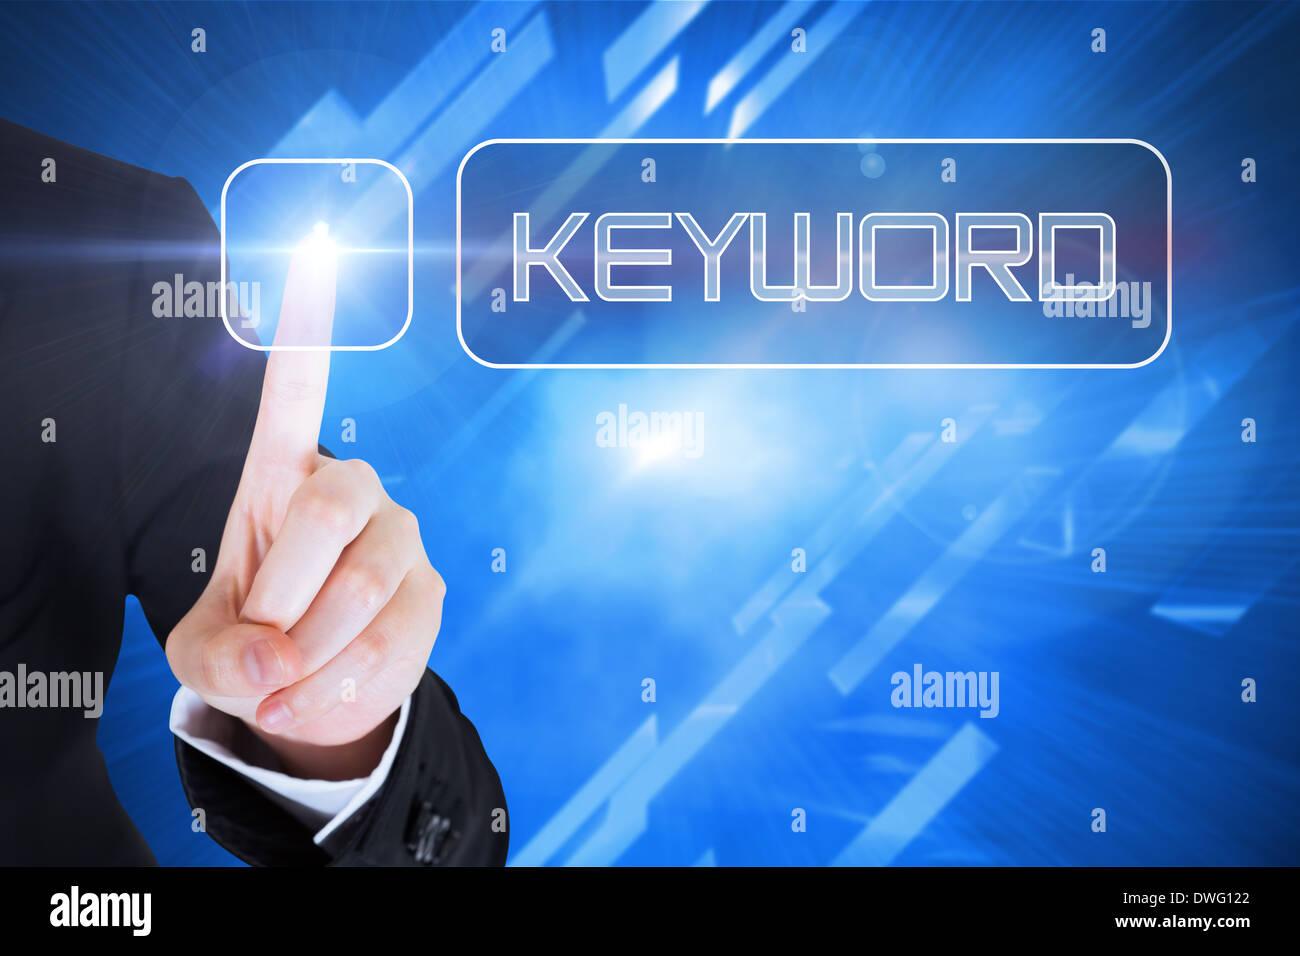 Businesswomans finger touching Keyword button - Stock Image